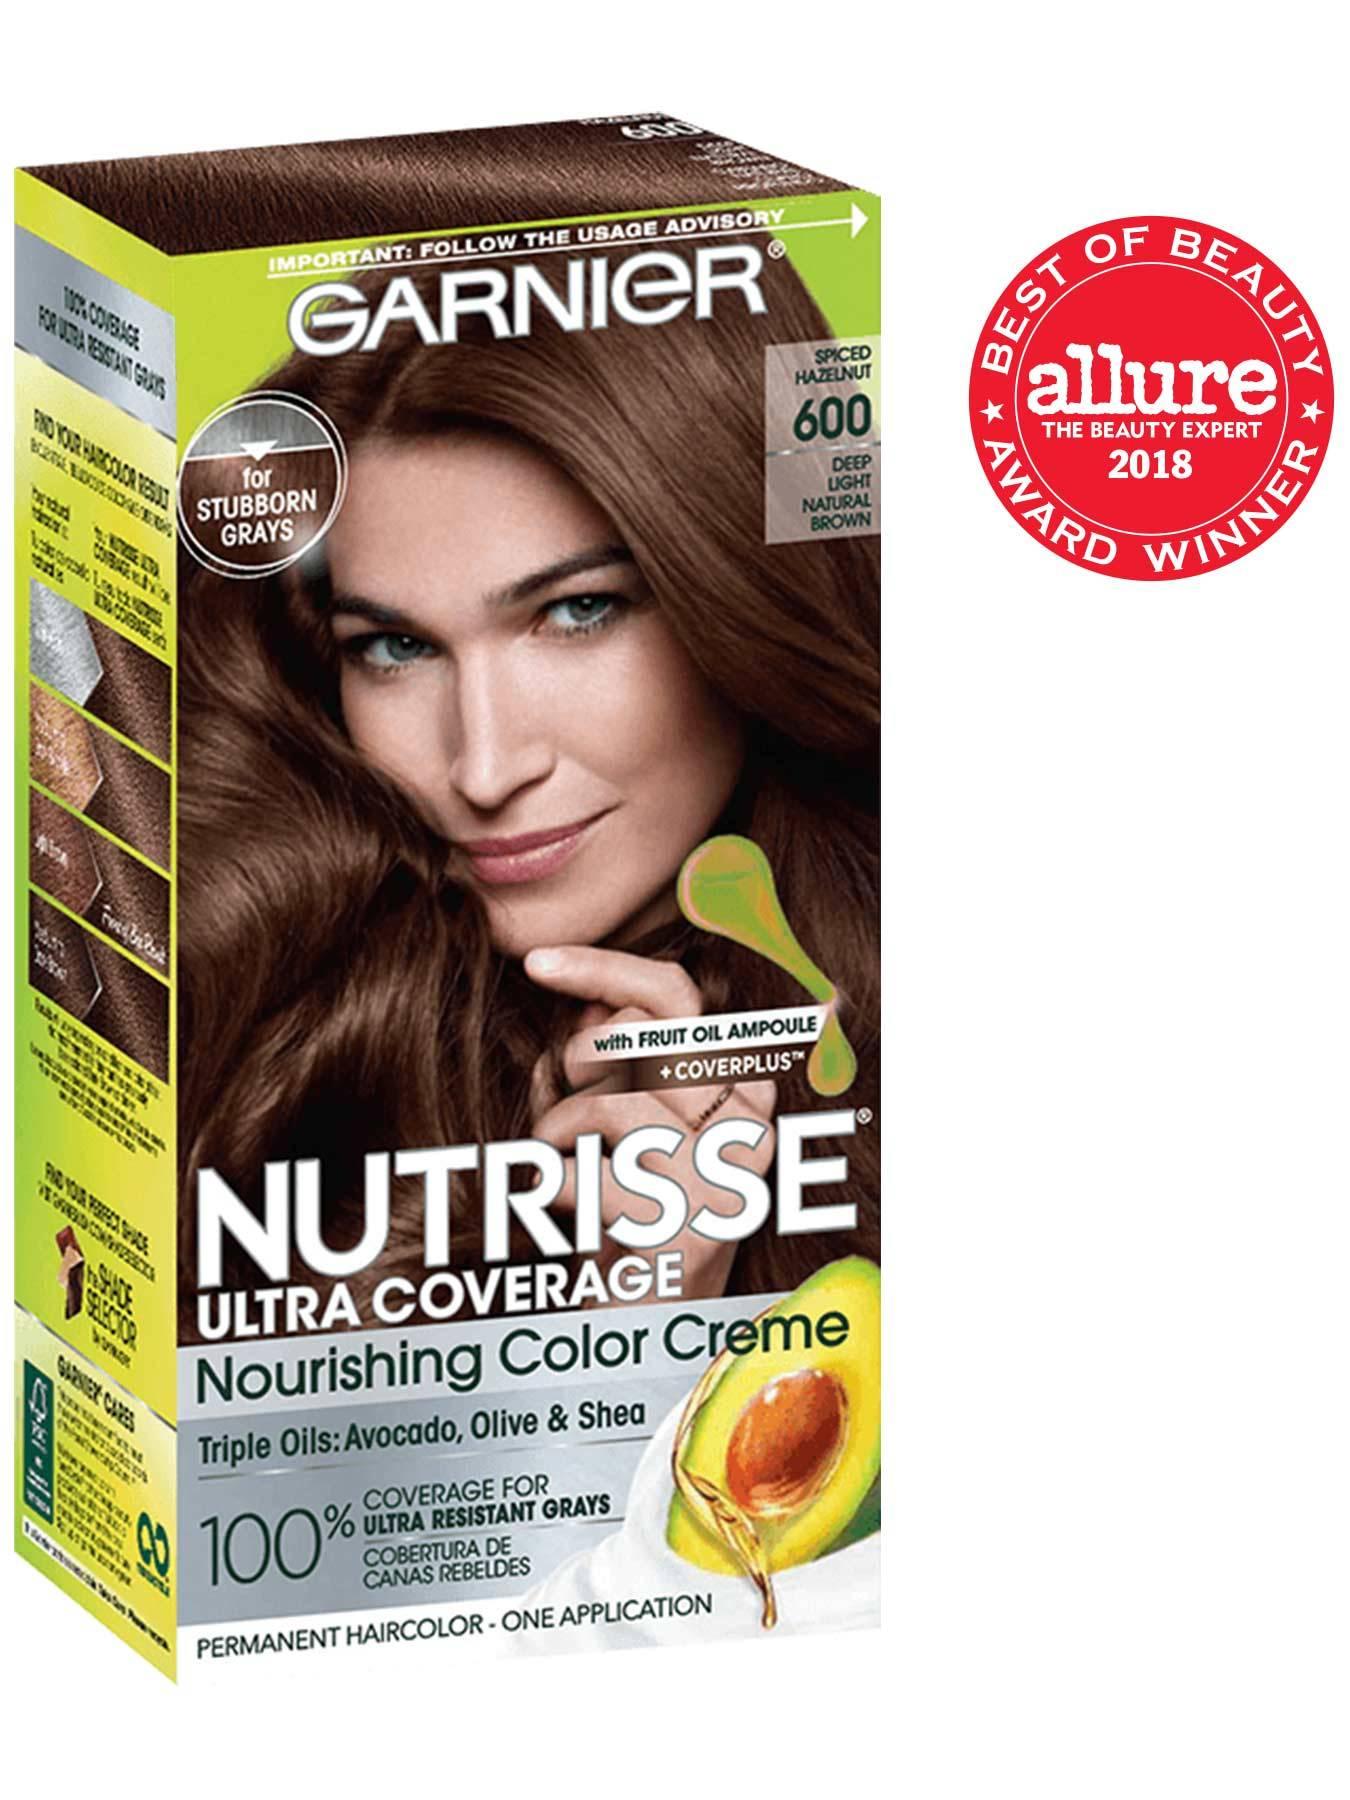 Nutrisse Ultra Coverage Neutral Light Brown Hair Color